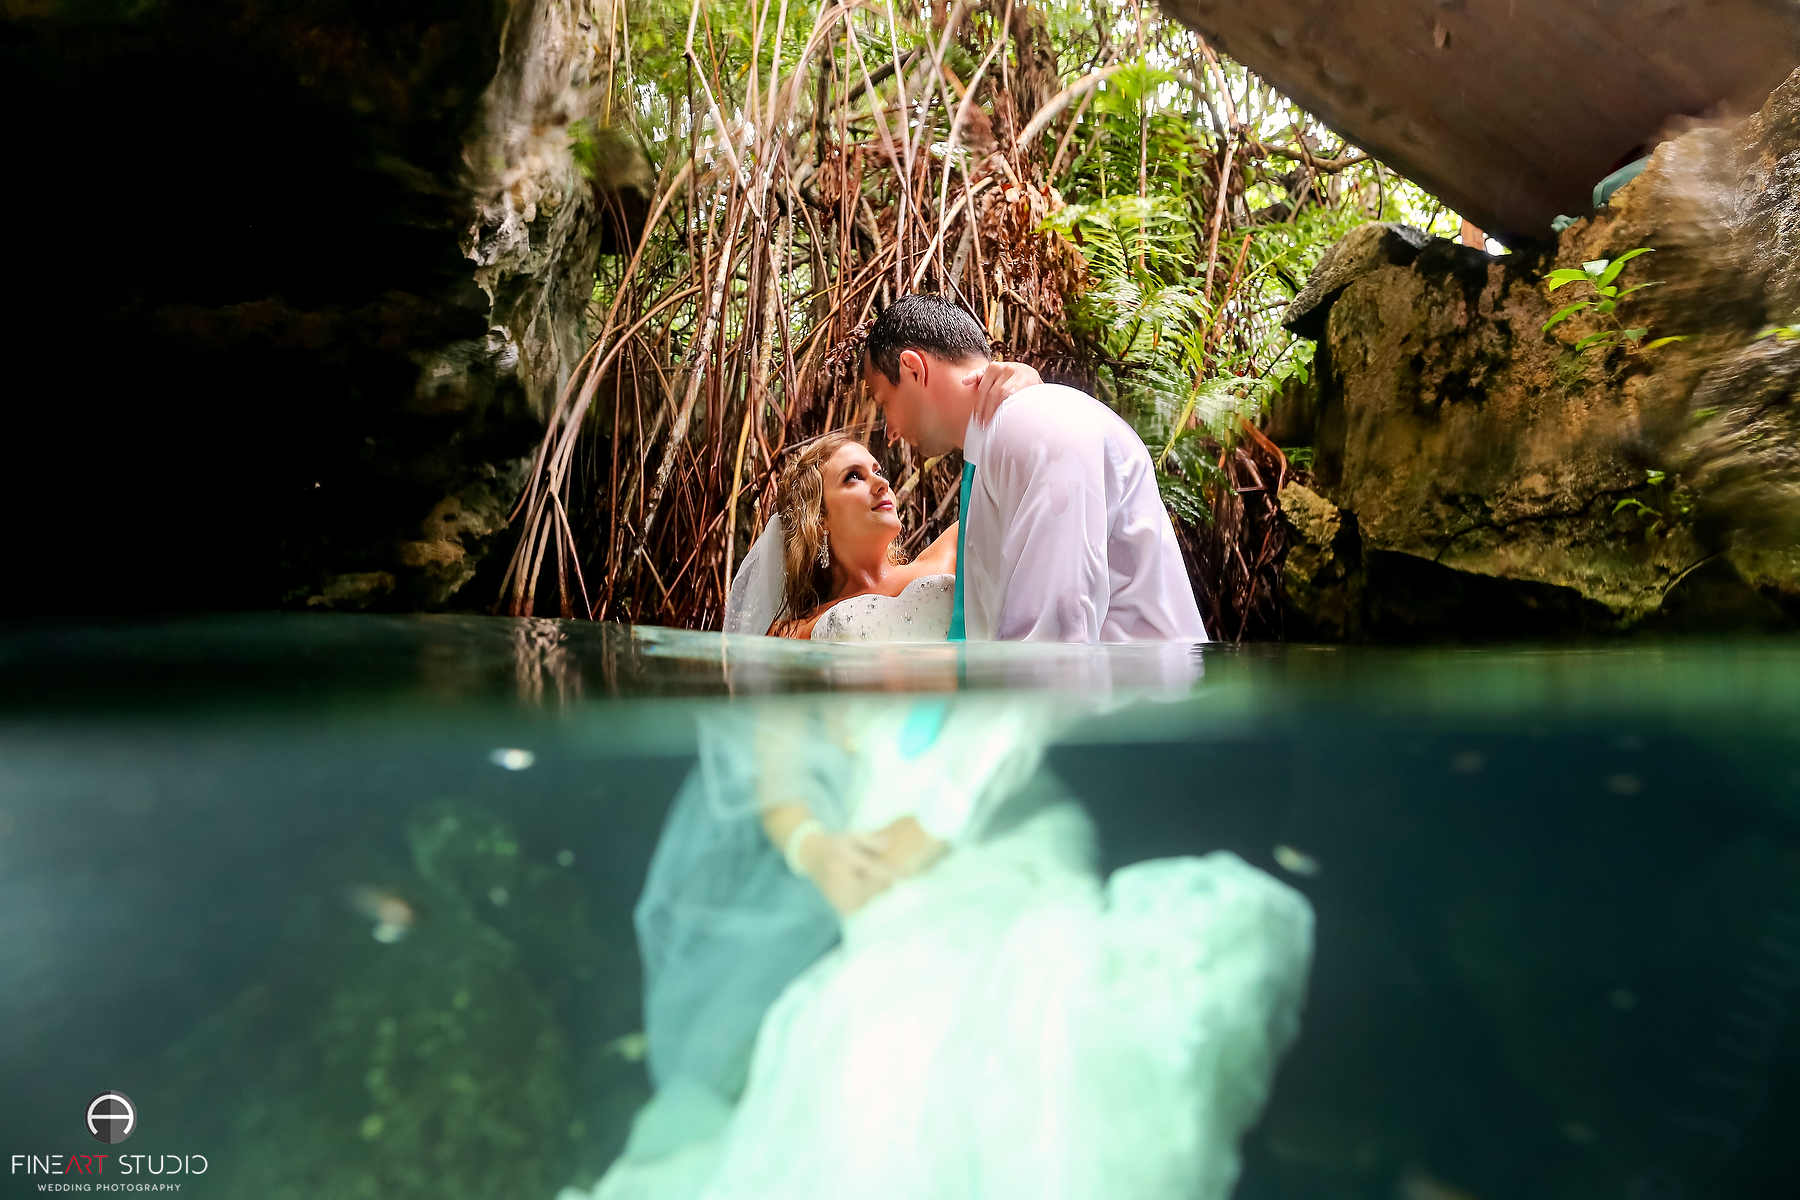 Trash the Dress Photography Cancun Riviera Maya - FineArt Studio